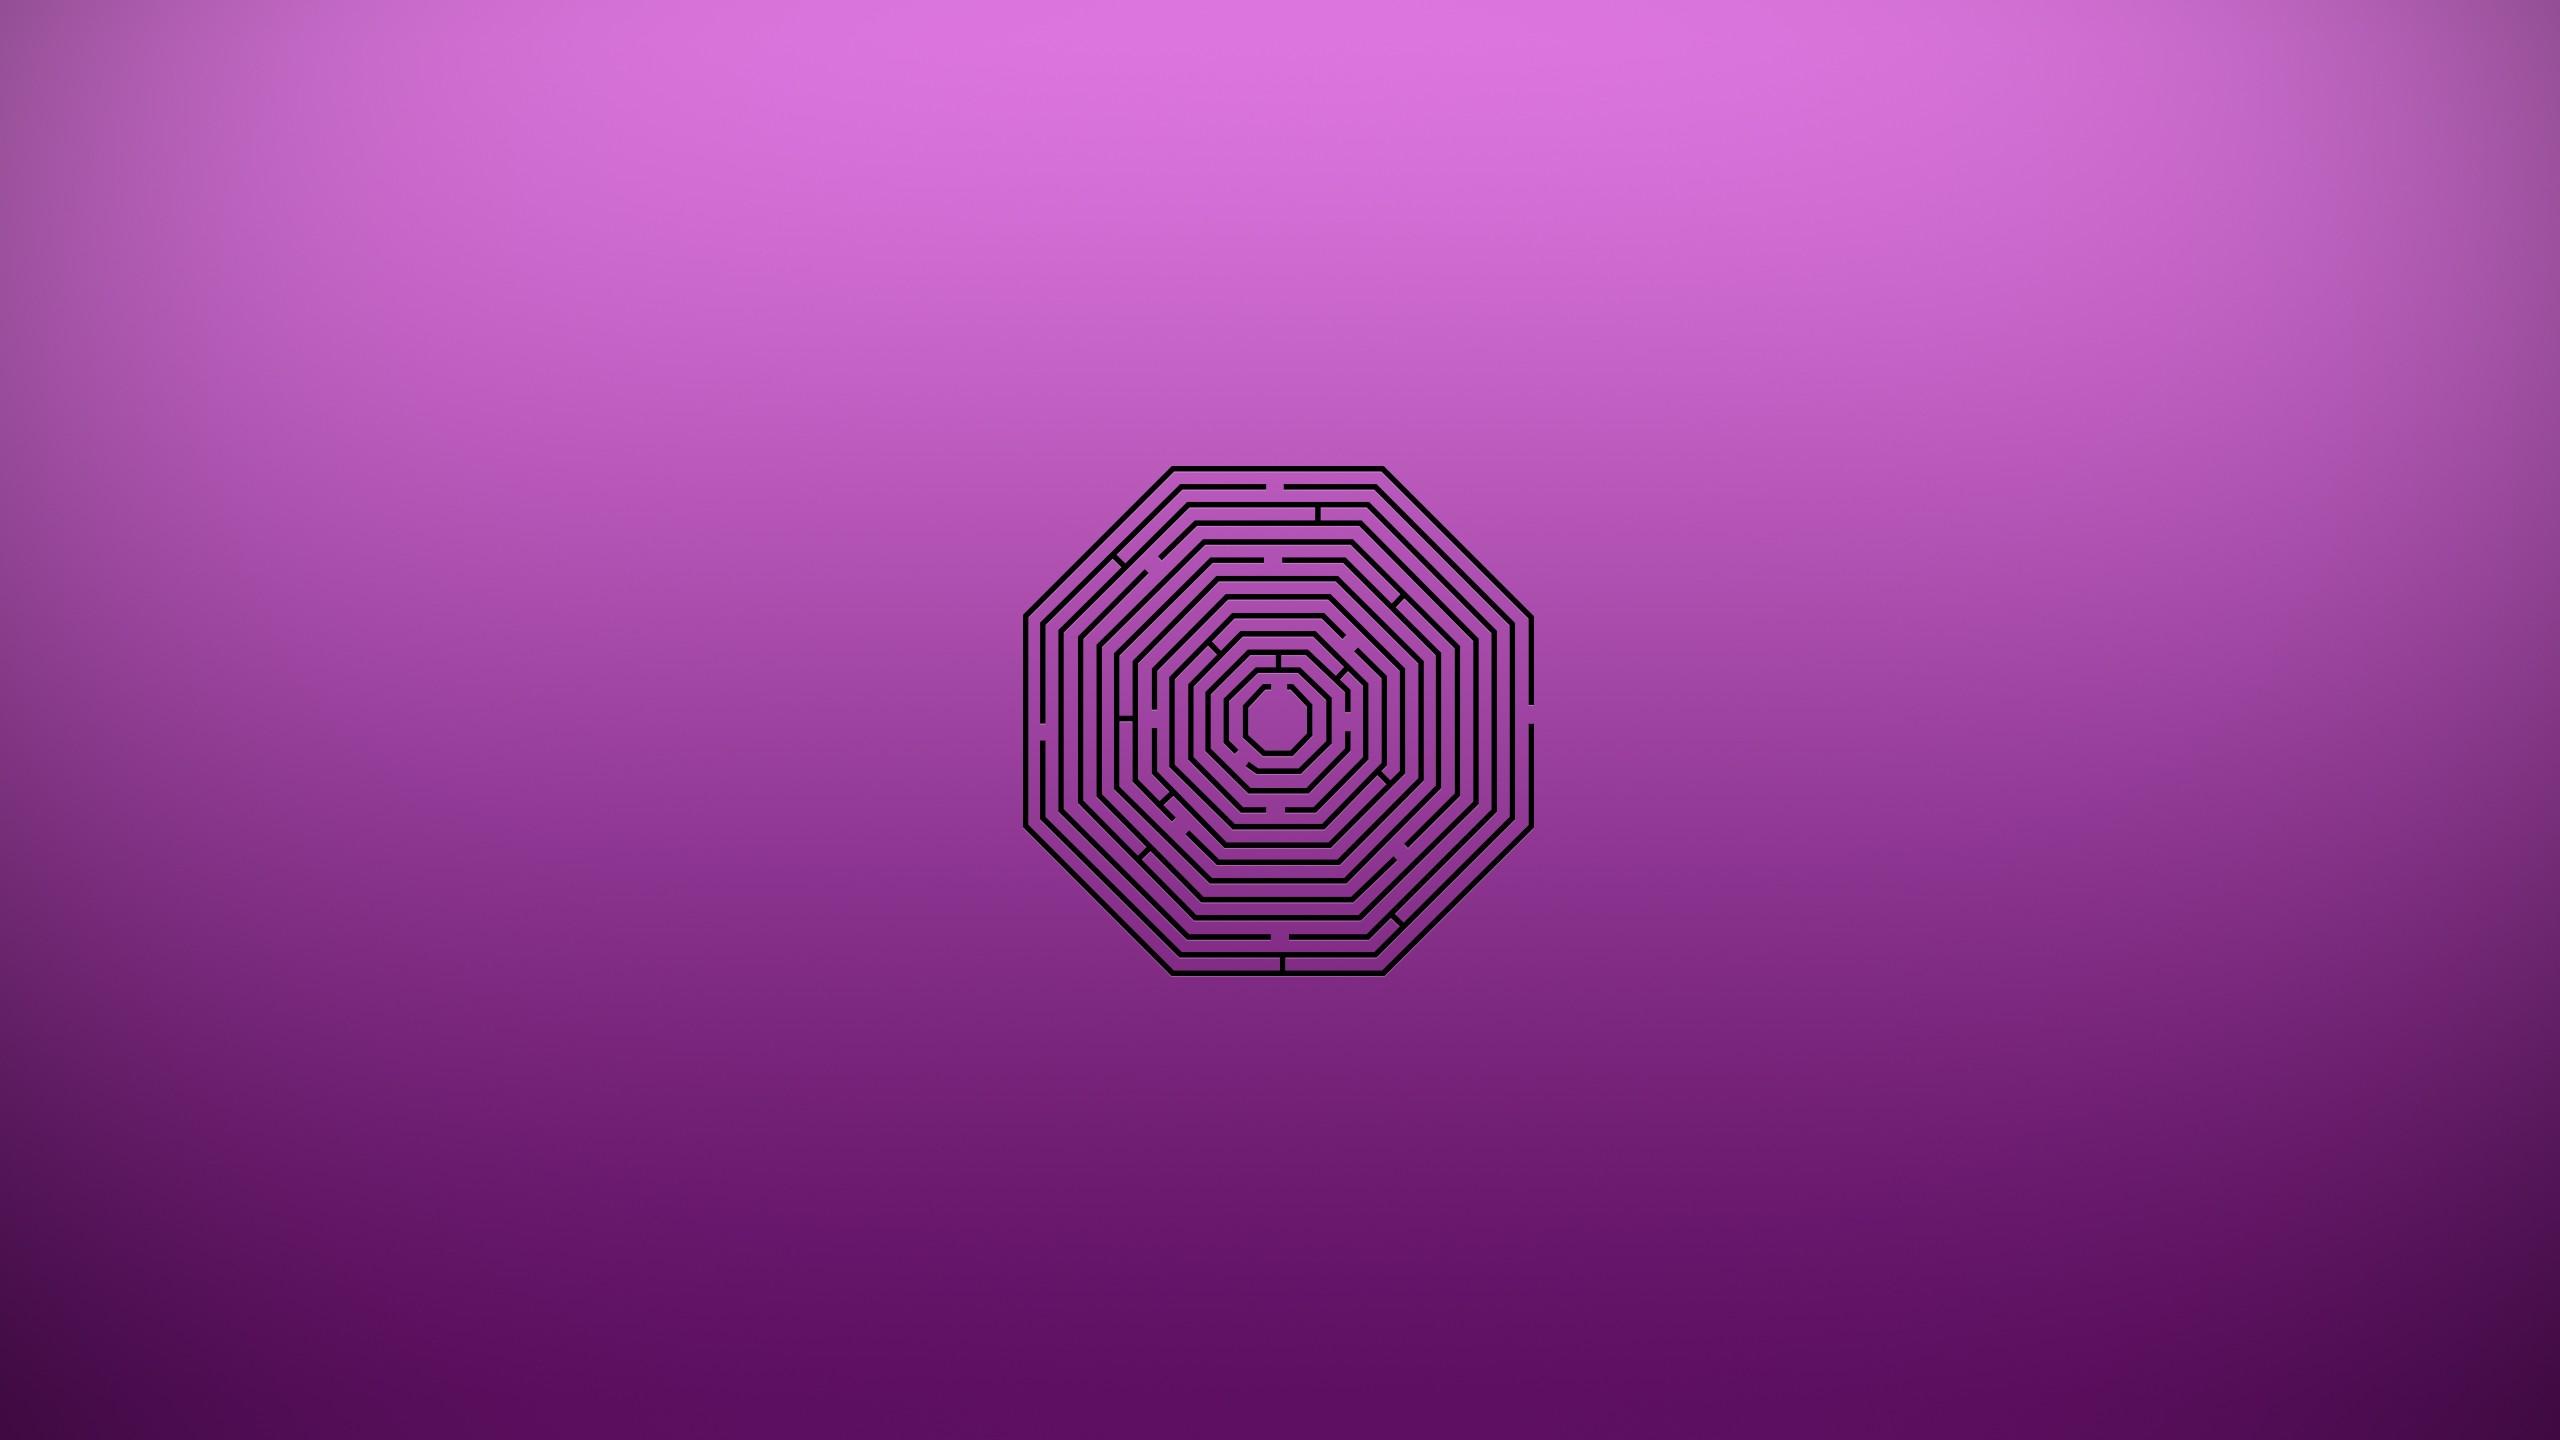 purple maze wallpaper 61183